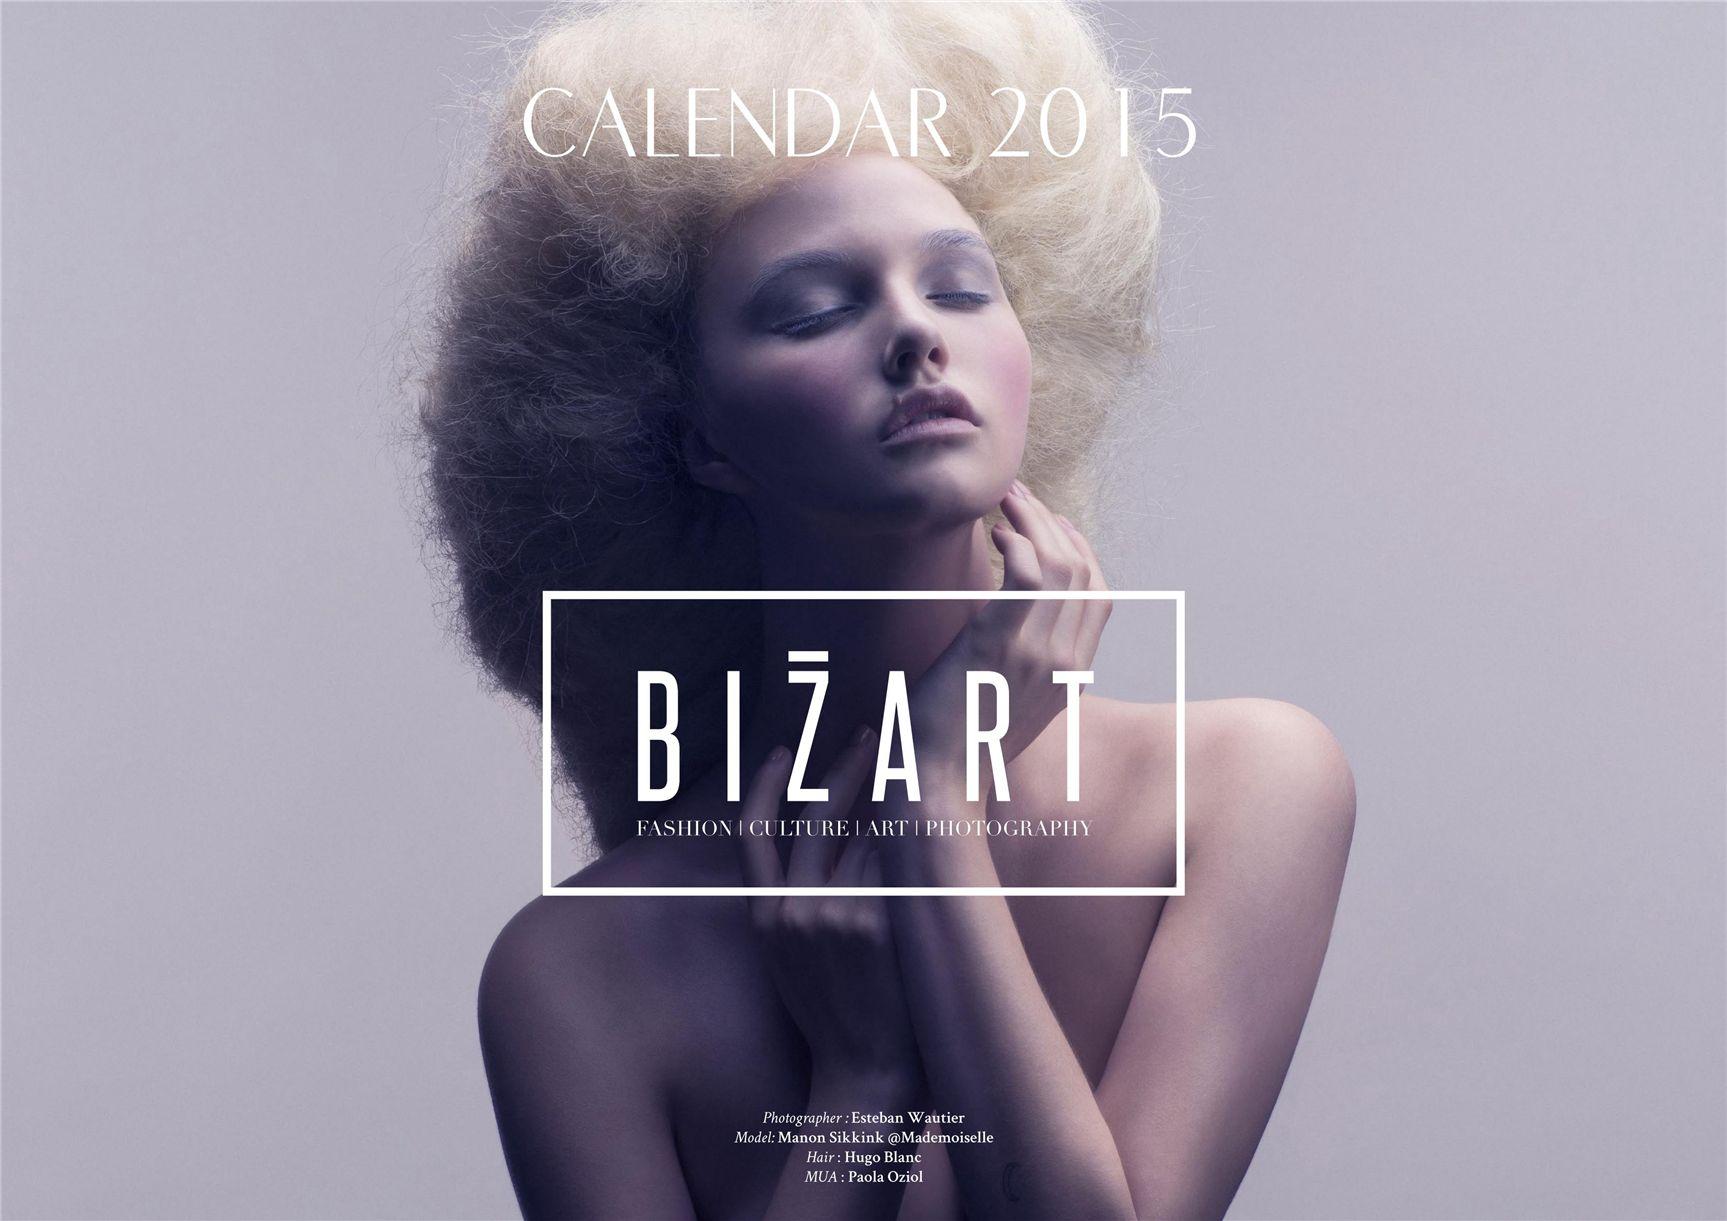 модно-артистический календарь журнала Bizart 2015 calendar - Manon Sikkink by Esteban Wautier